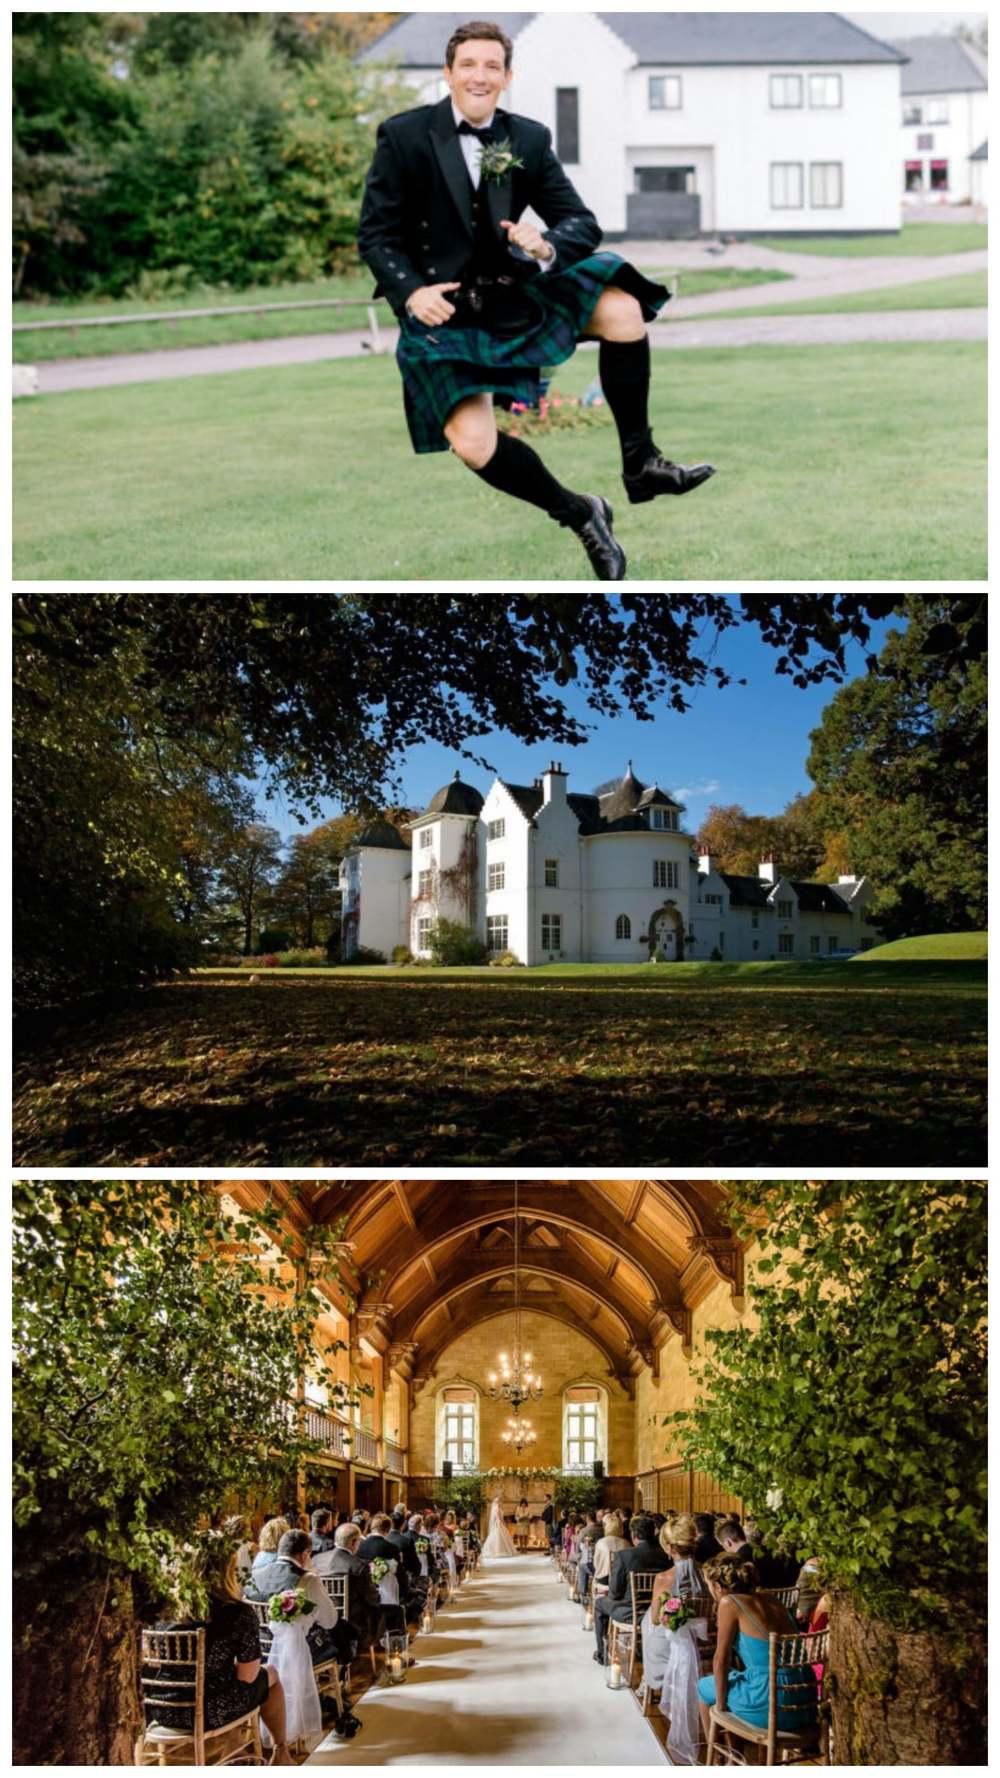 12 Best Wedding Venues in The UK | XENIA MOTIF Creative ...